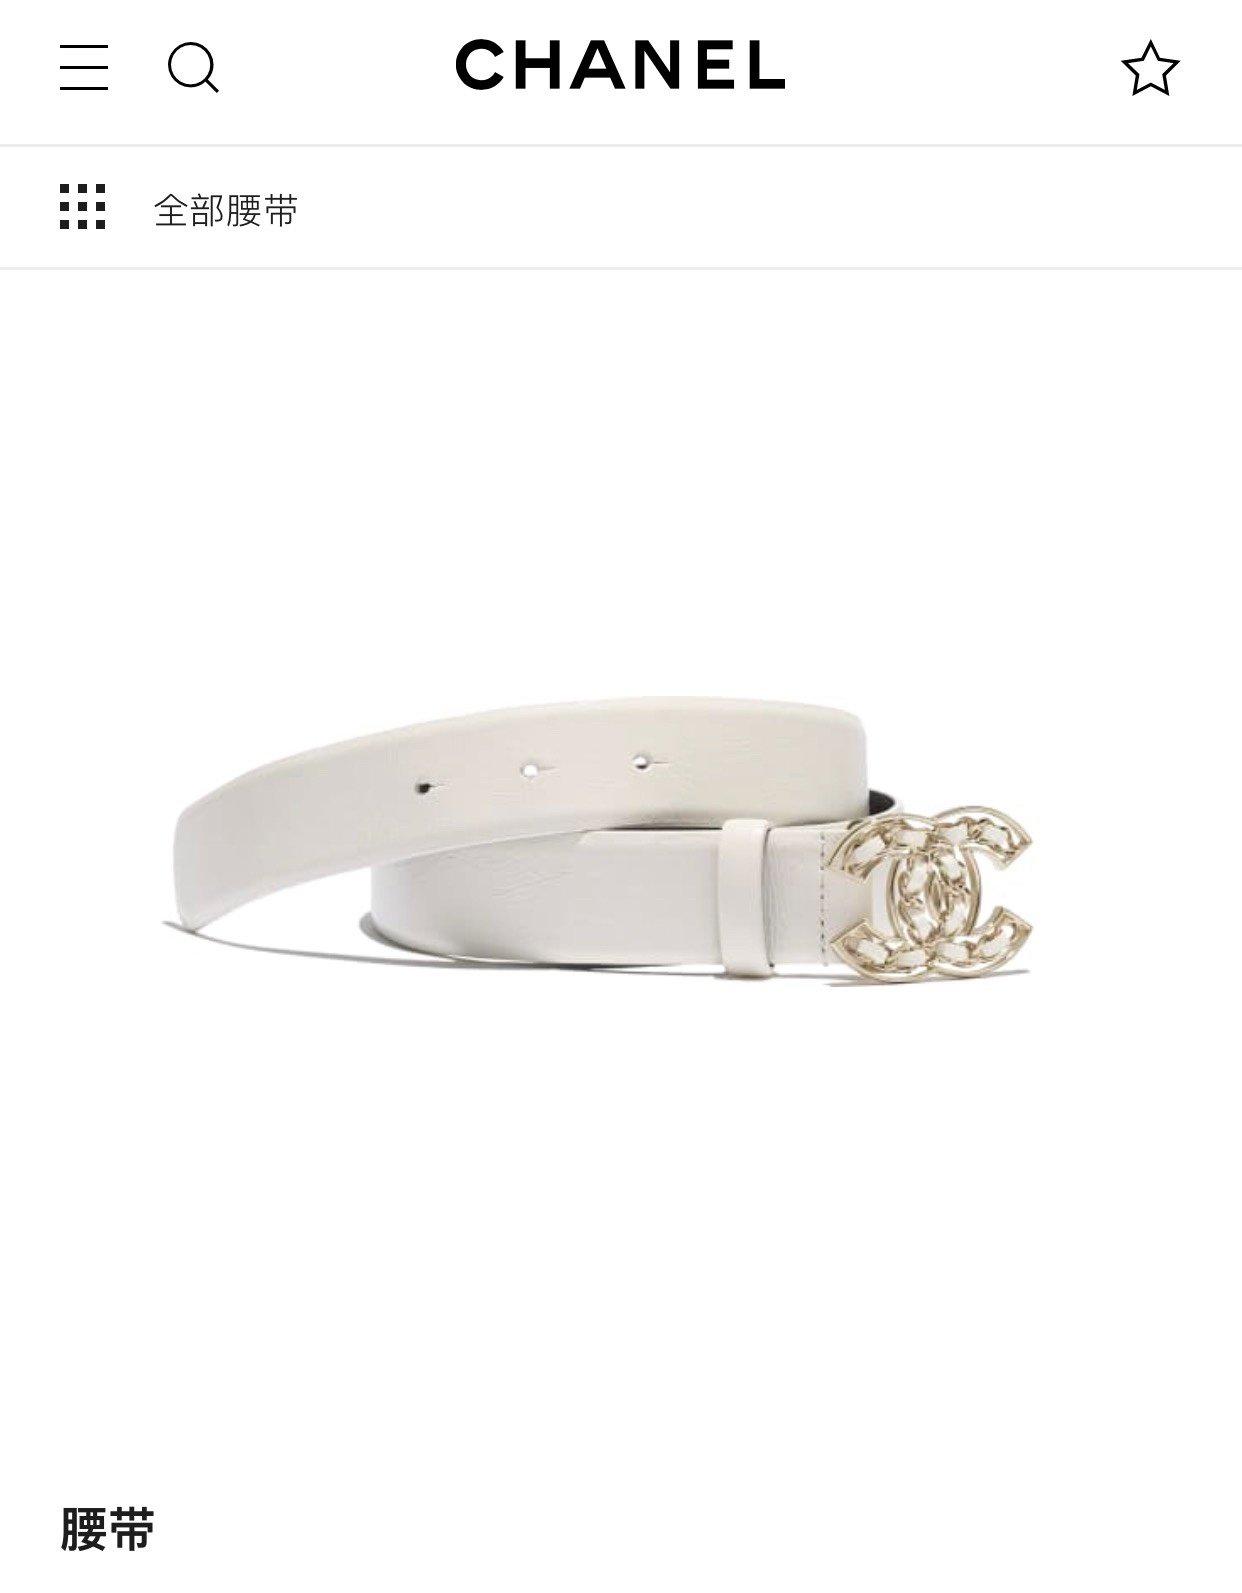 chanel 香奈儿cc编织logo扣. 双面头层进口皮软腰带(图3)